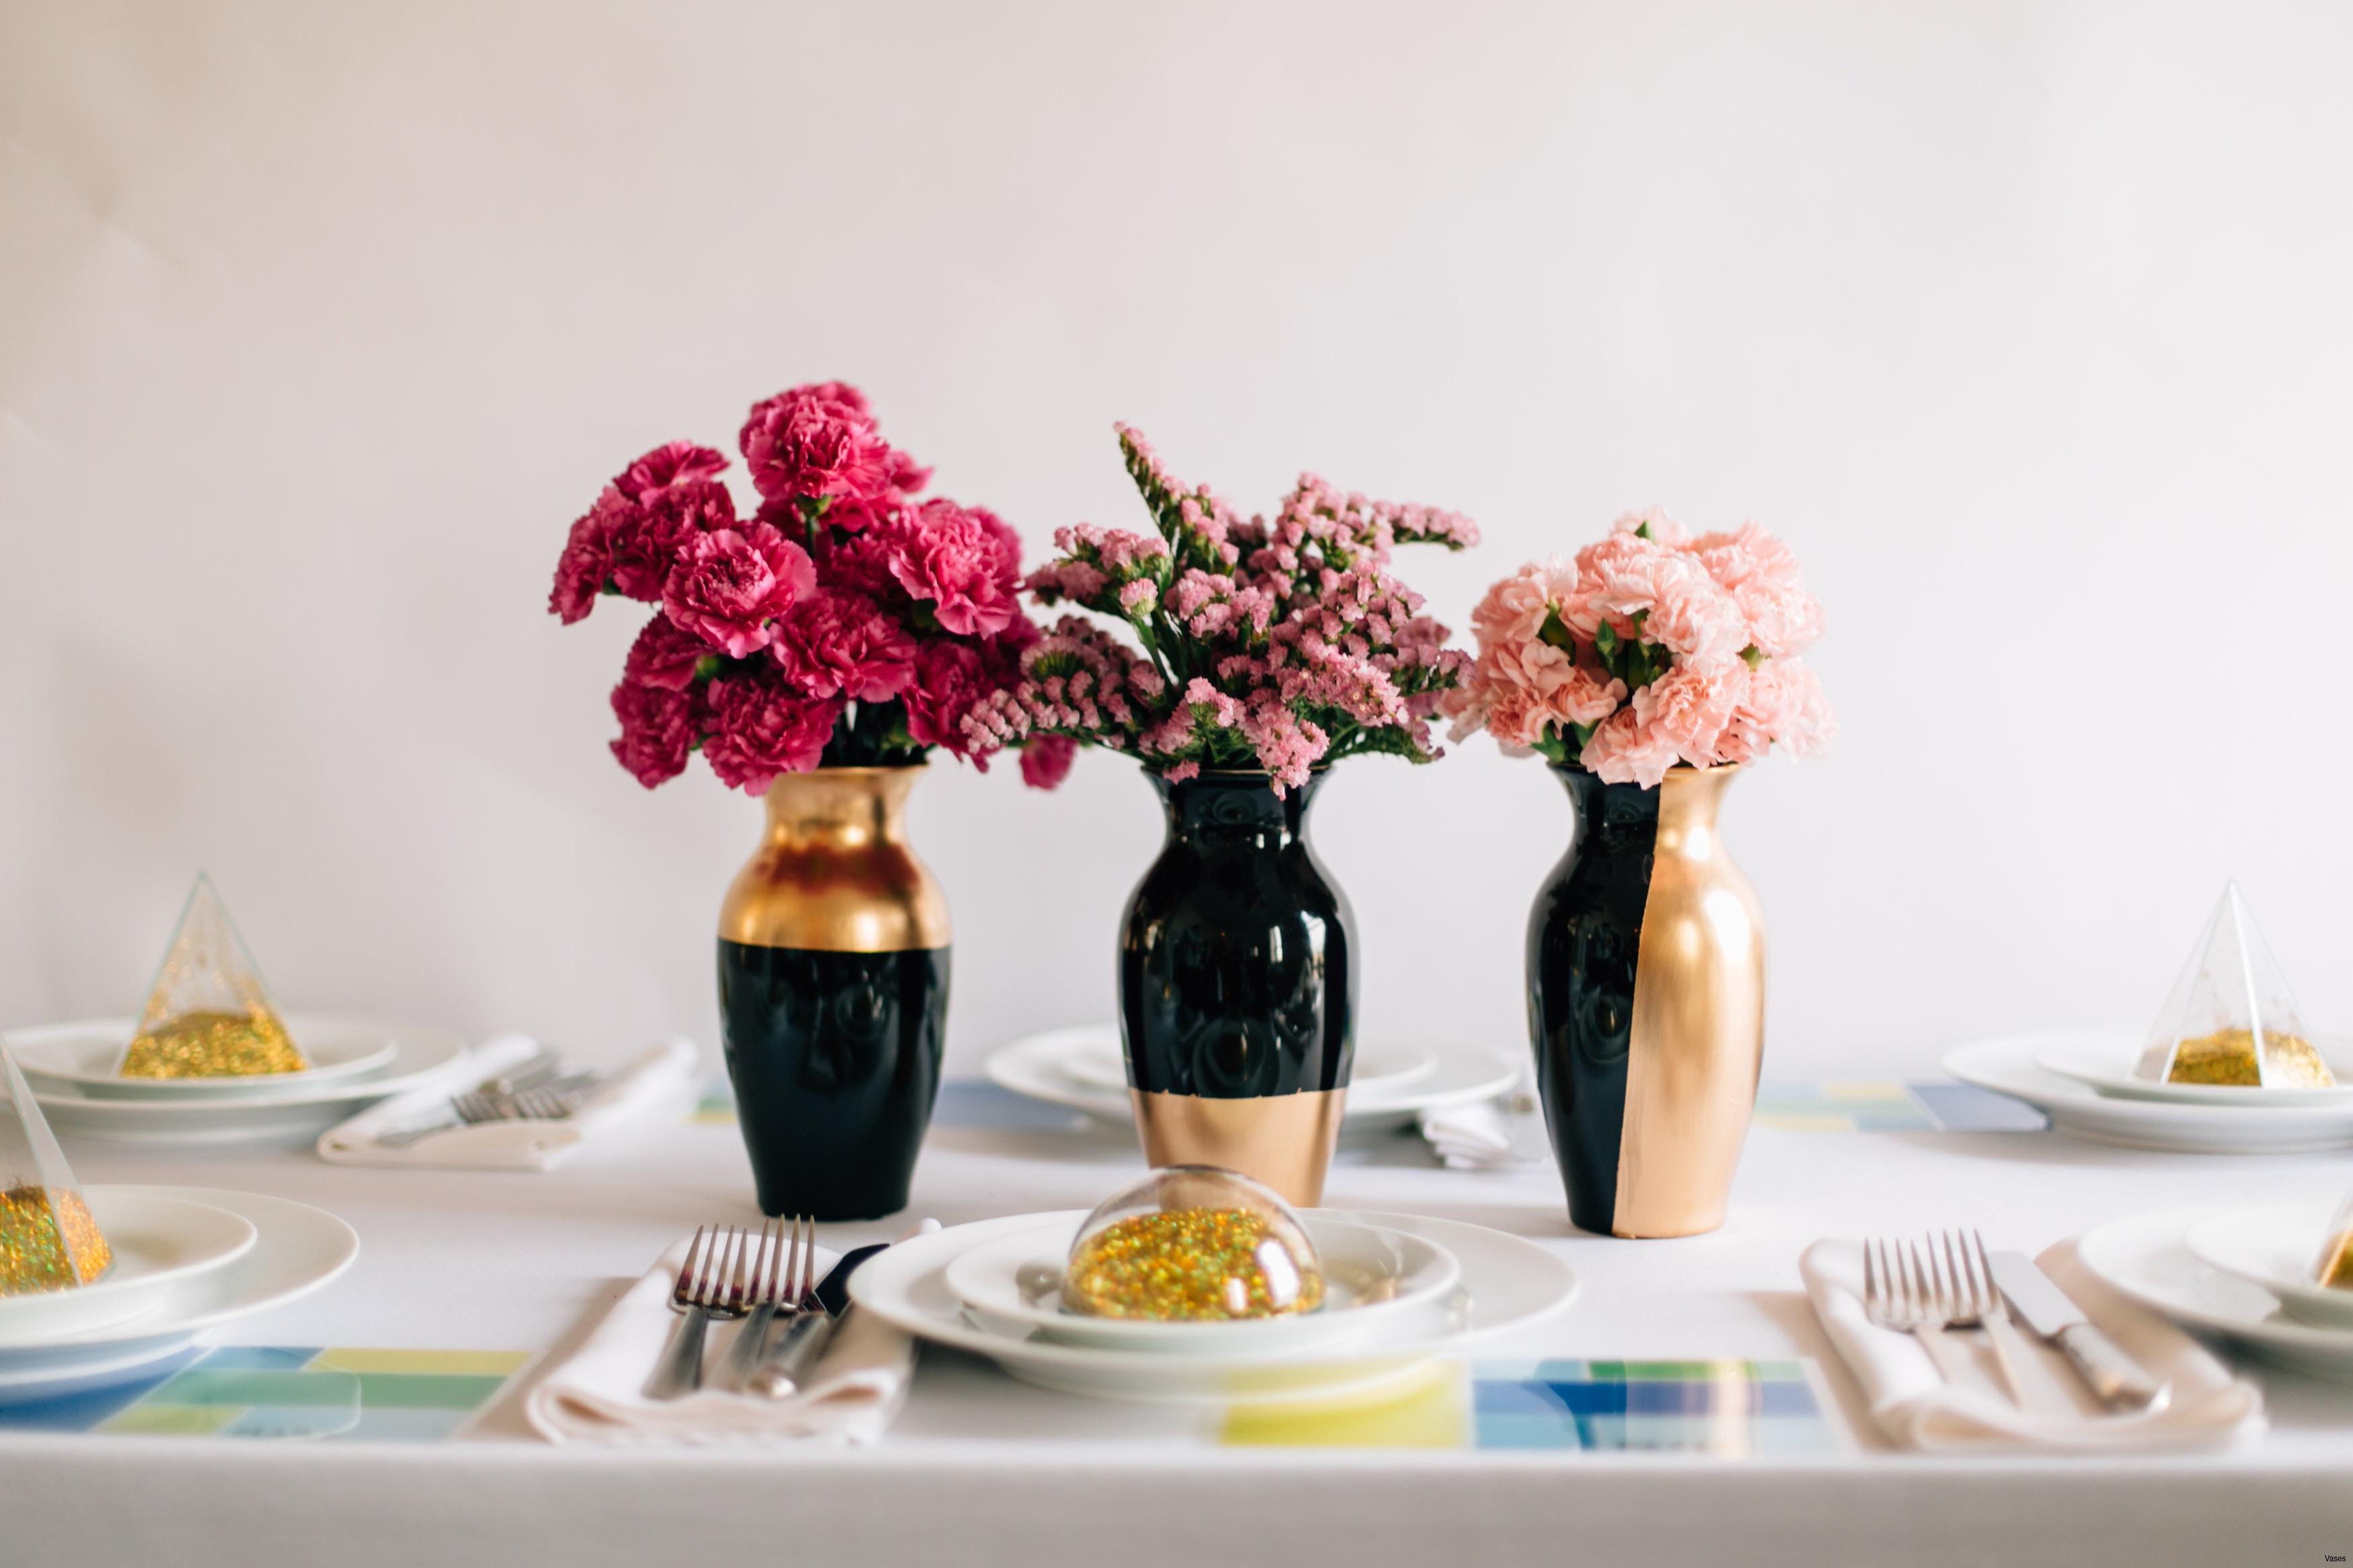 flower vase stand of wooden table vases fresh h vases wall hanging flower vase newspaper within wooden table vases luxury 35 elegant silver flower vases of wooden table vases fresh h vases